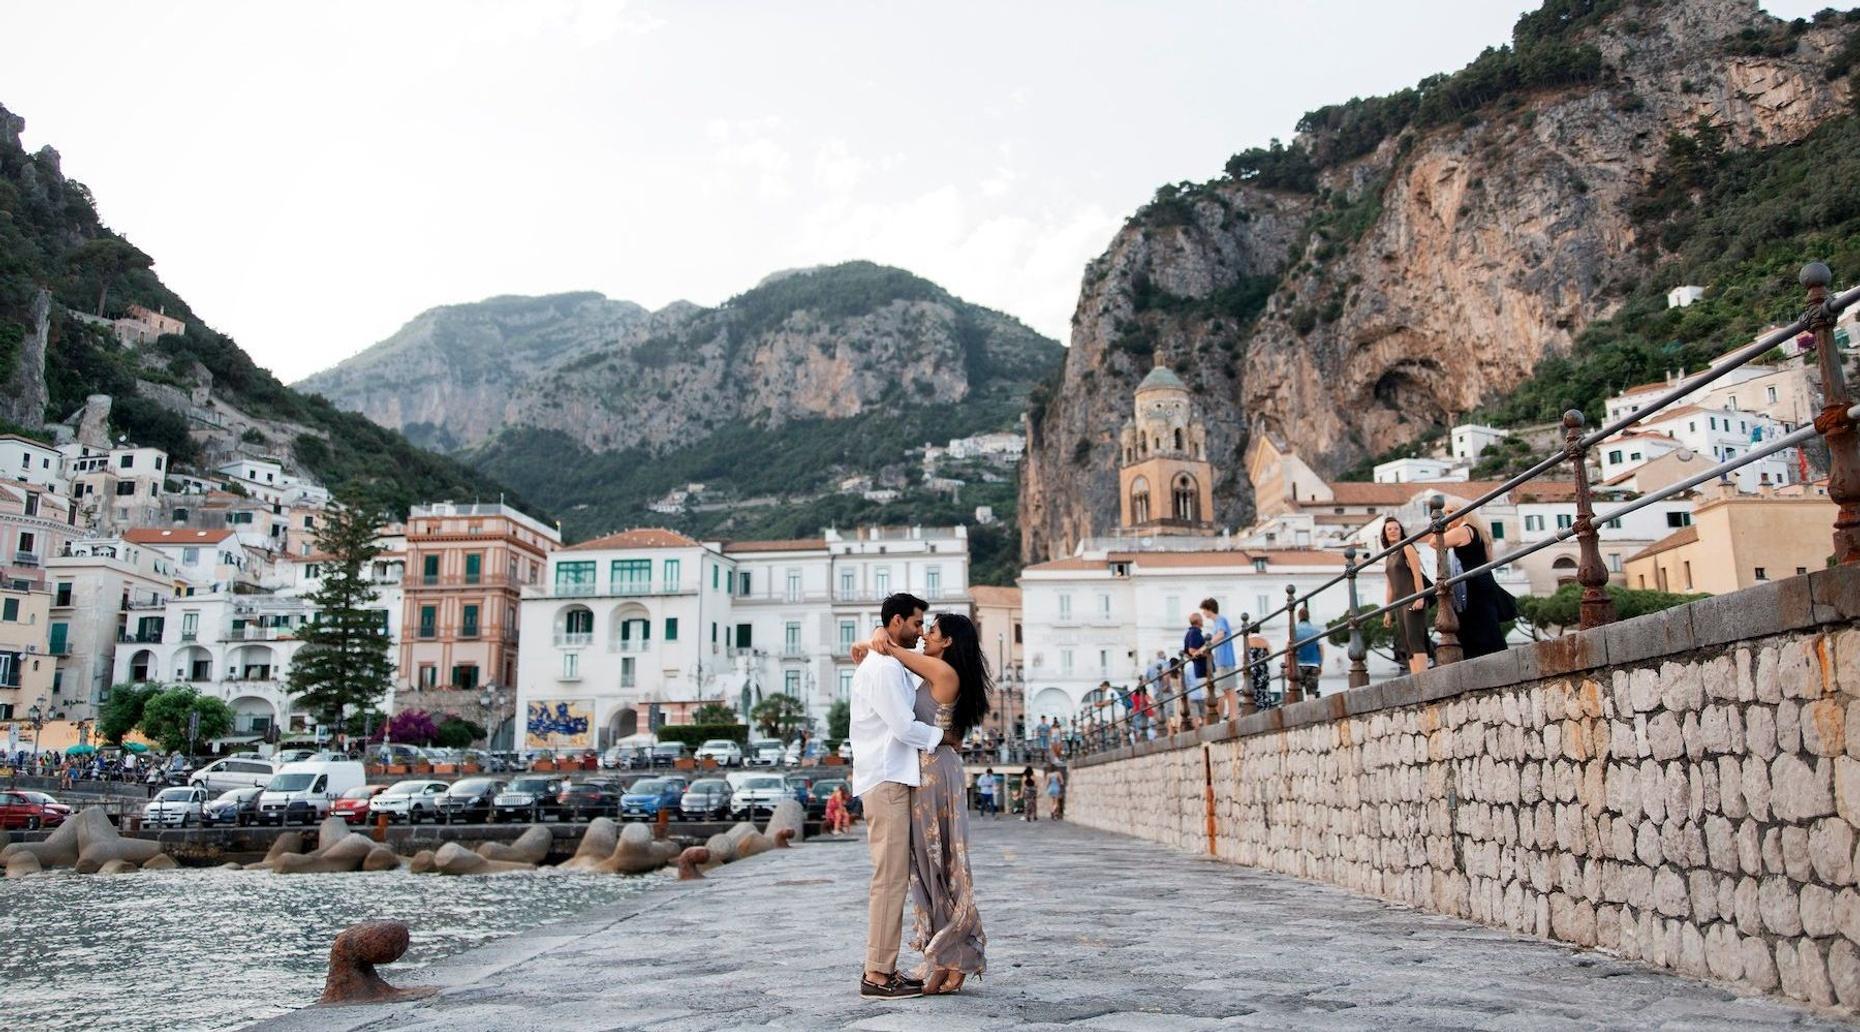 1-Hour Amalfi Coast Photo Shoot